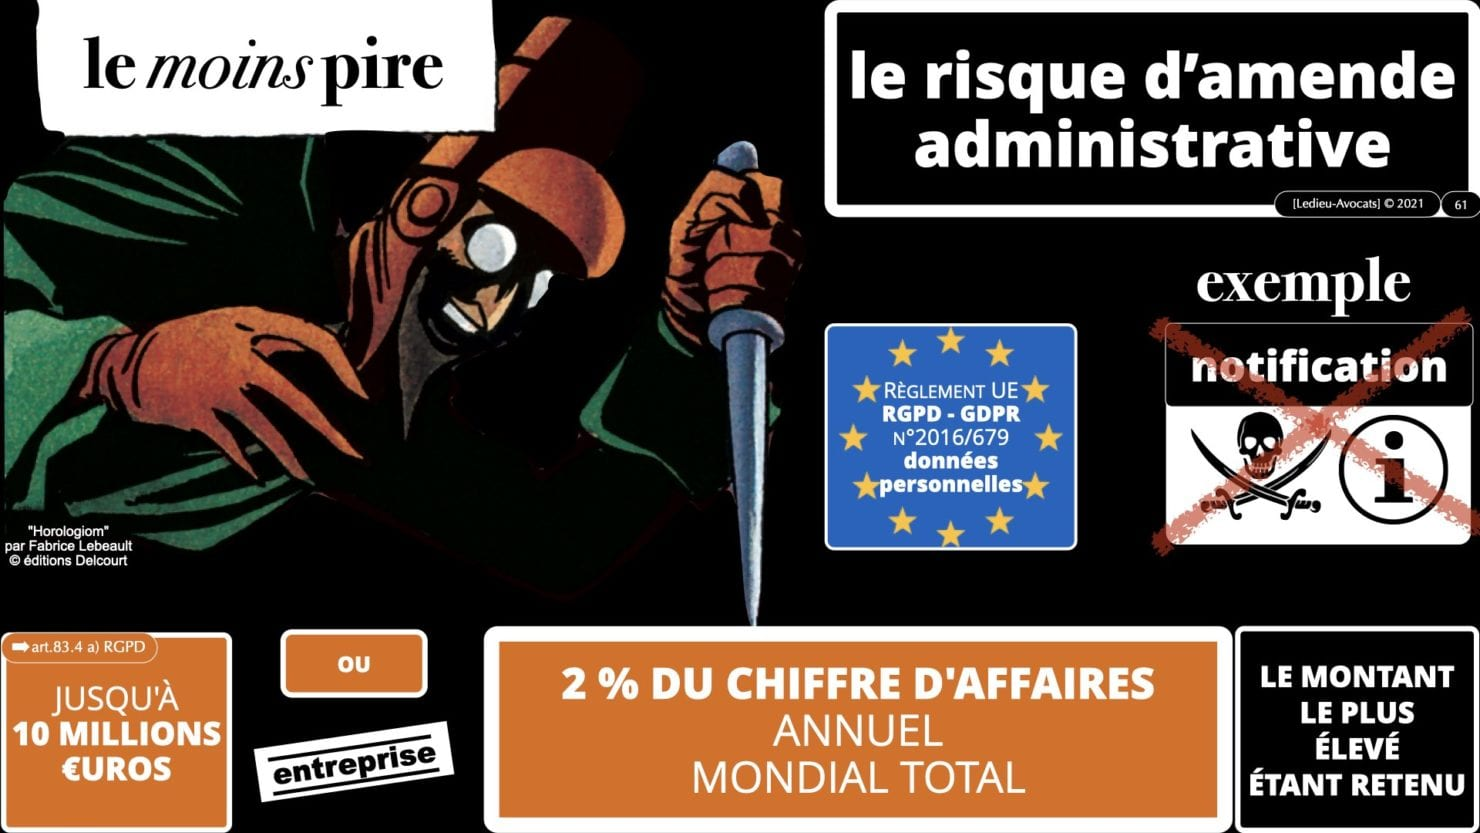 RGPD e-Privacy principes actualité jurisprudence ©Ledieu-Avocats 25-06-2021.061